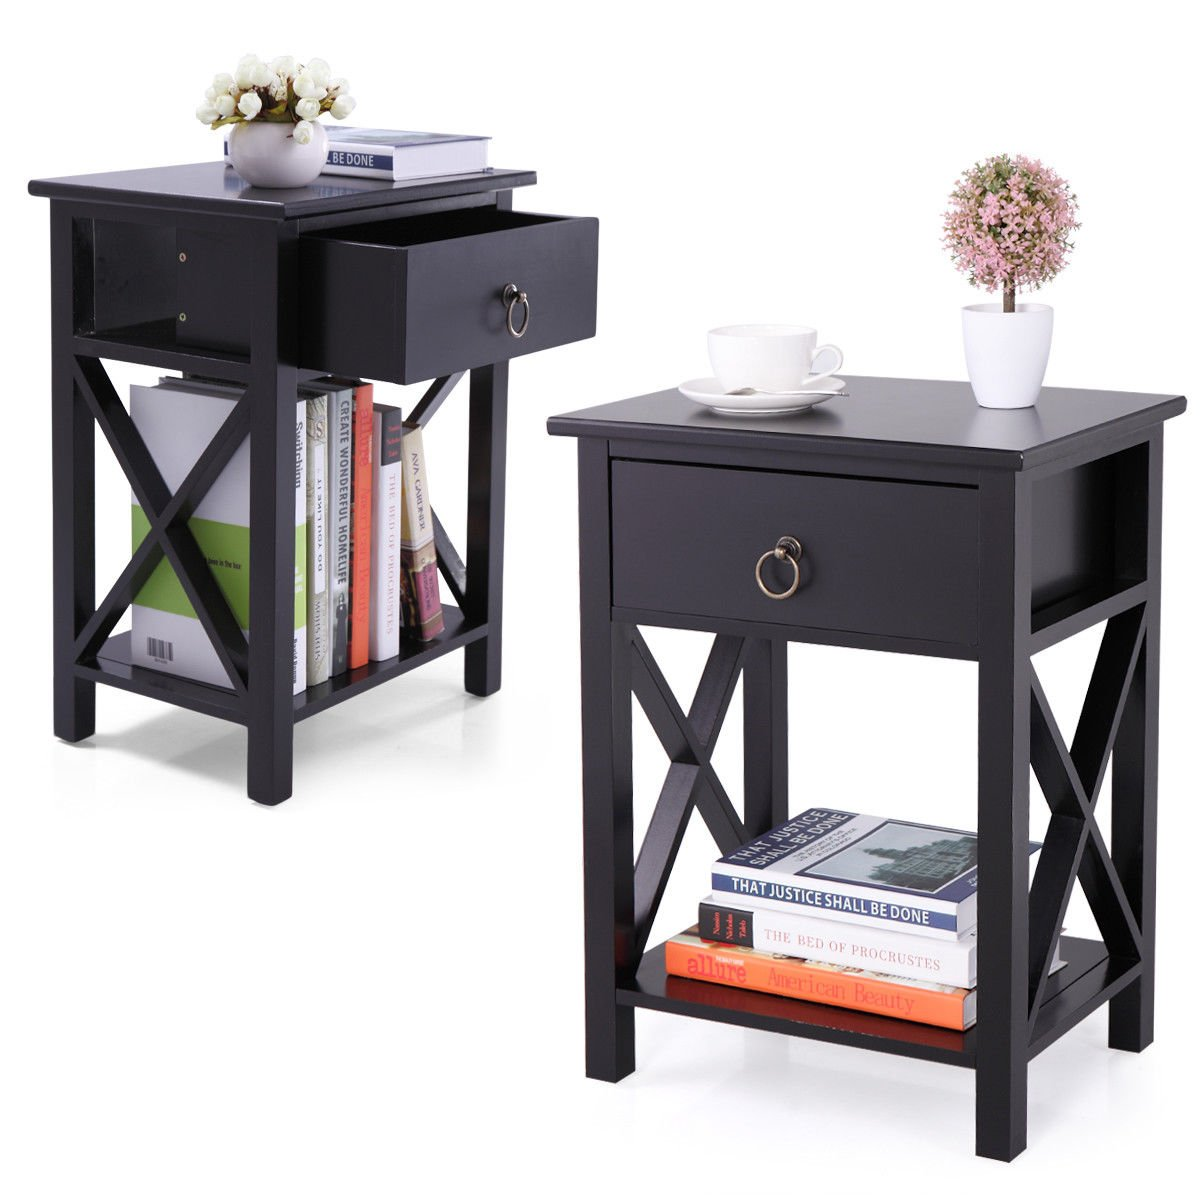 JAXPETY Set of 2 Black Finish X-Design Side End Table Night Stand Storage Shelf w/Bin by JAXPETY